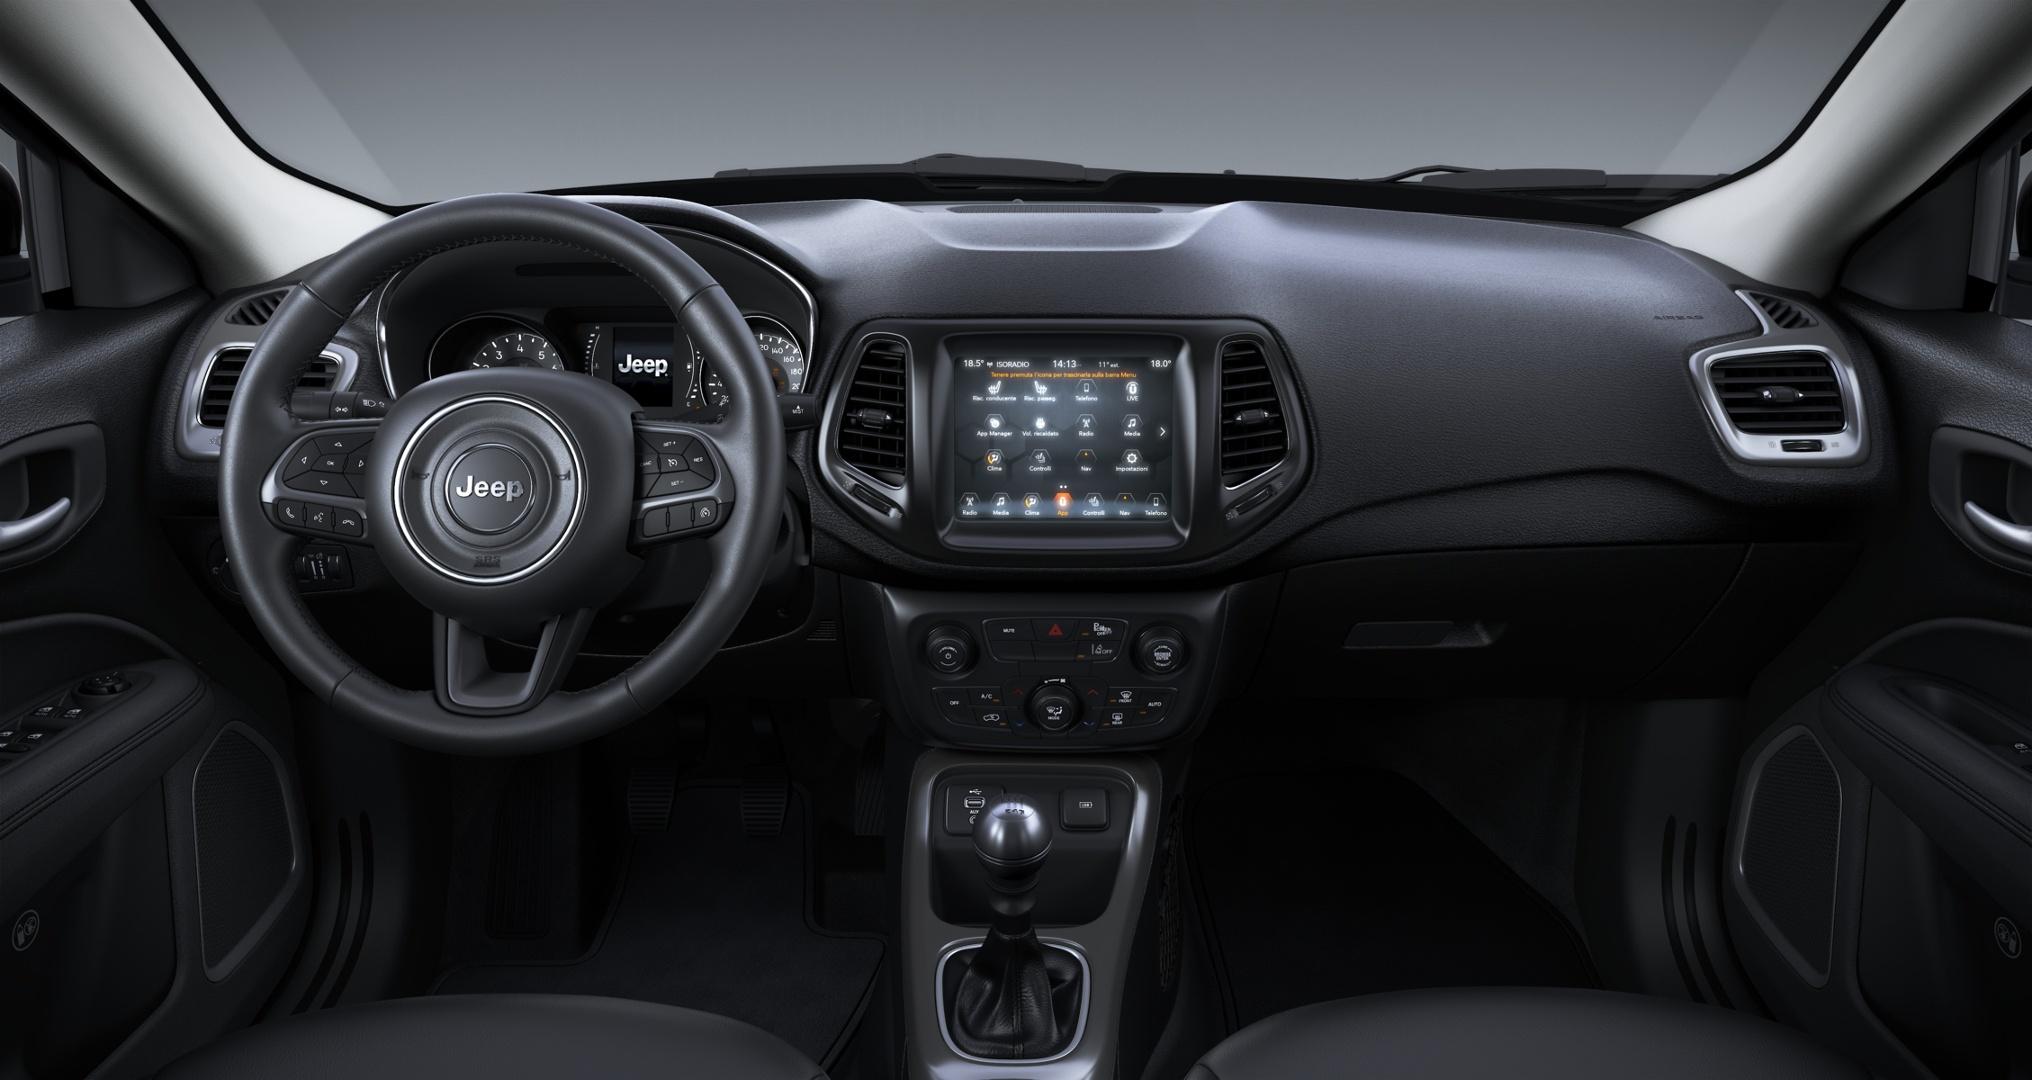 JEEP Compass 1.6 Multijet II 2WD Business Granite Crystal Km 0 KBU0UBK-e